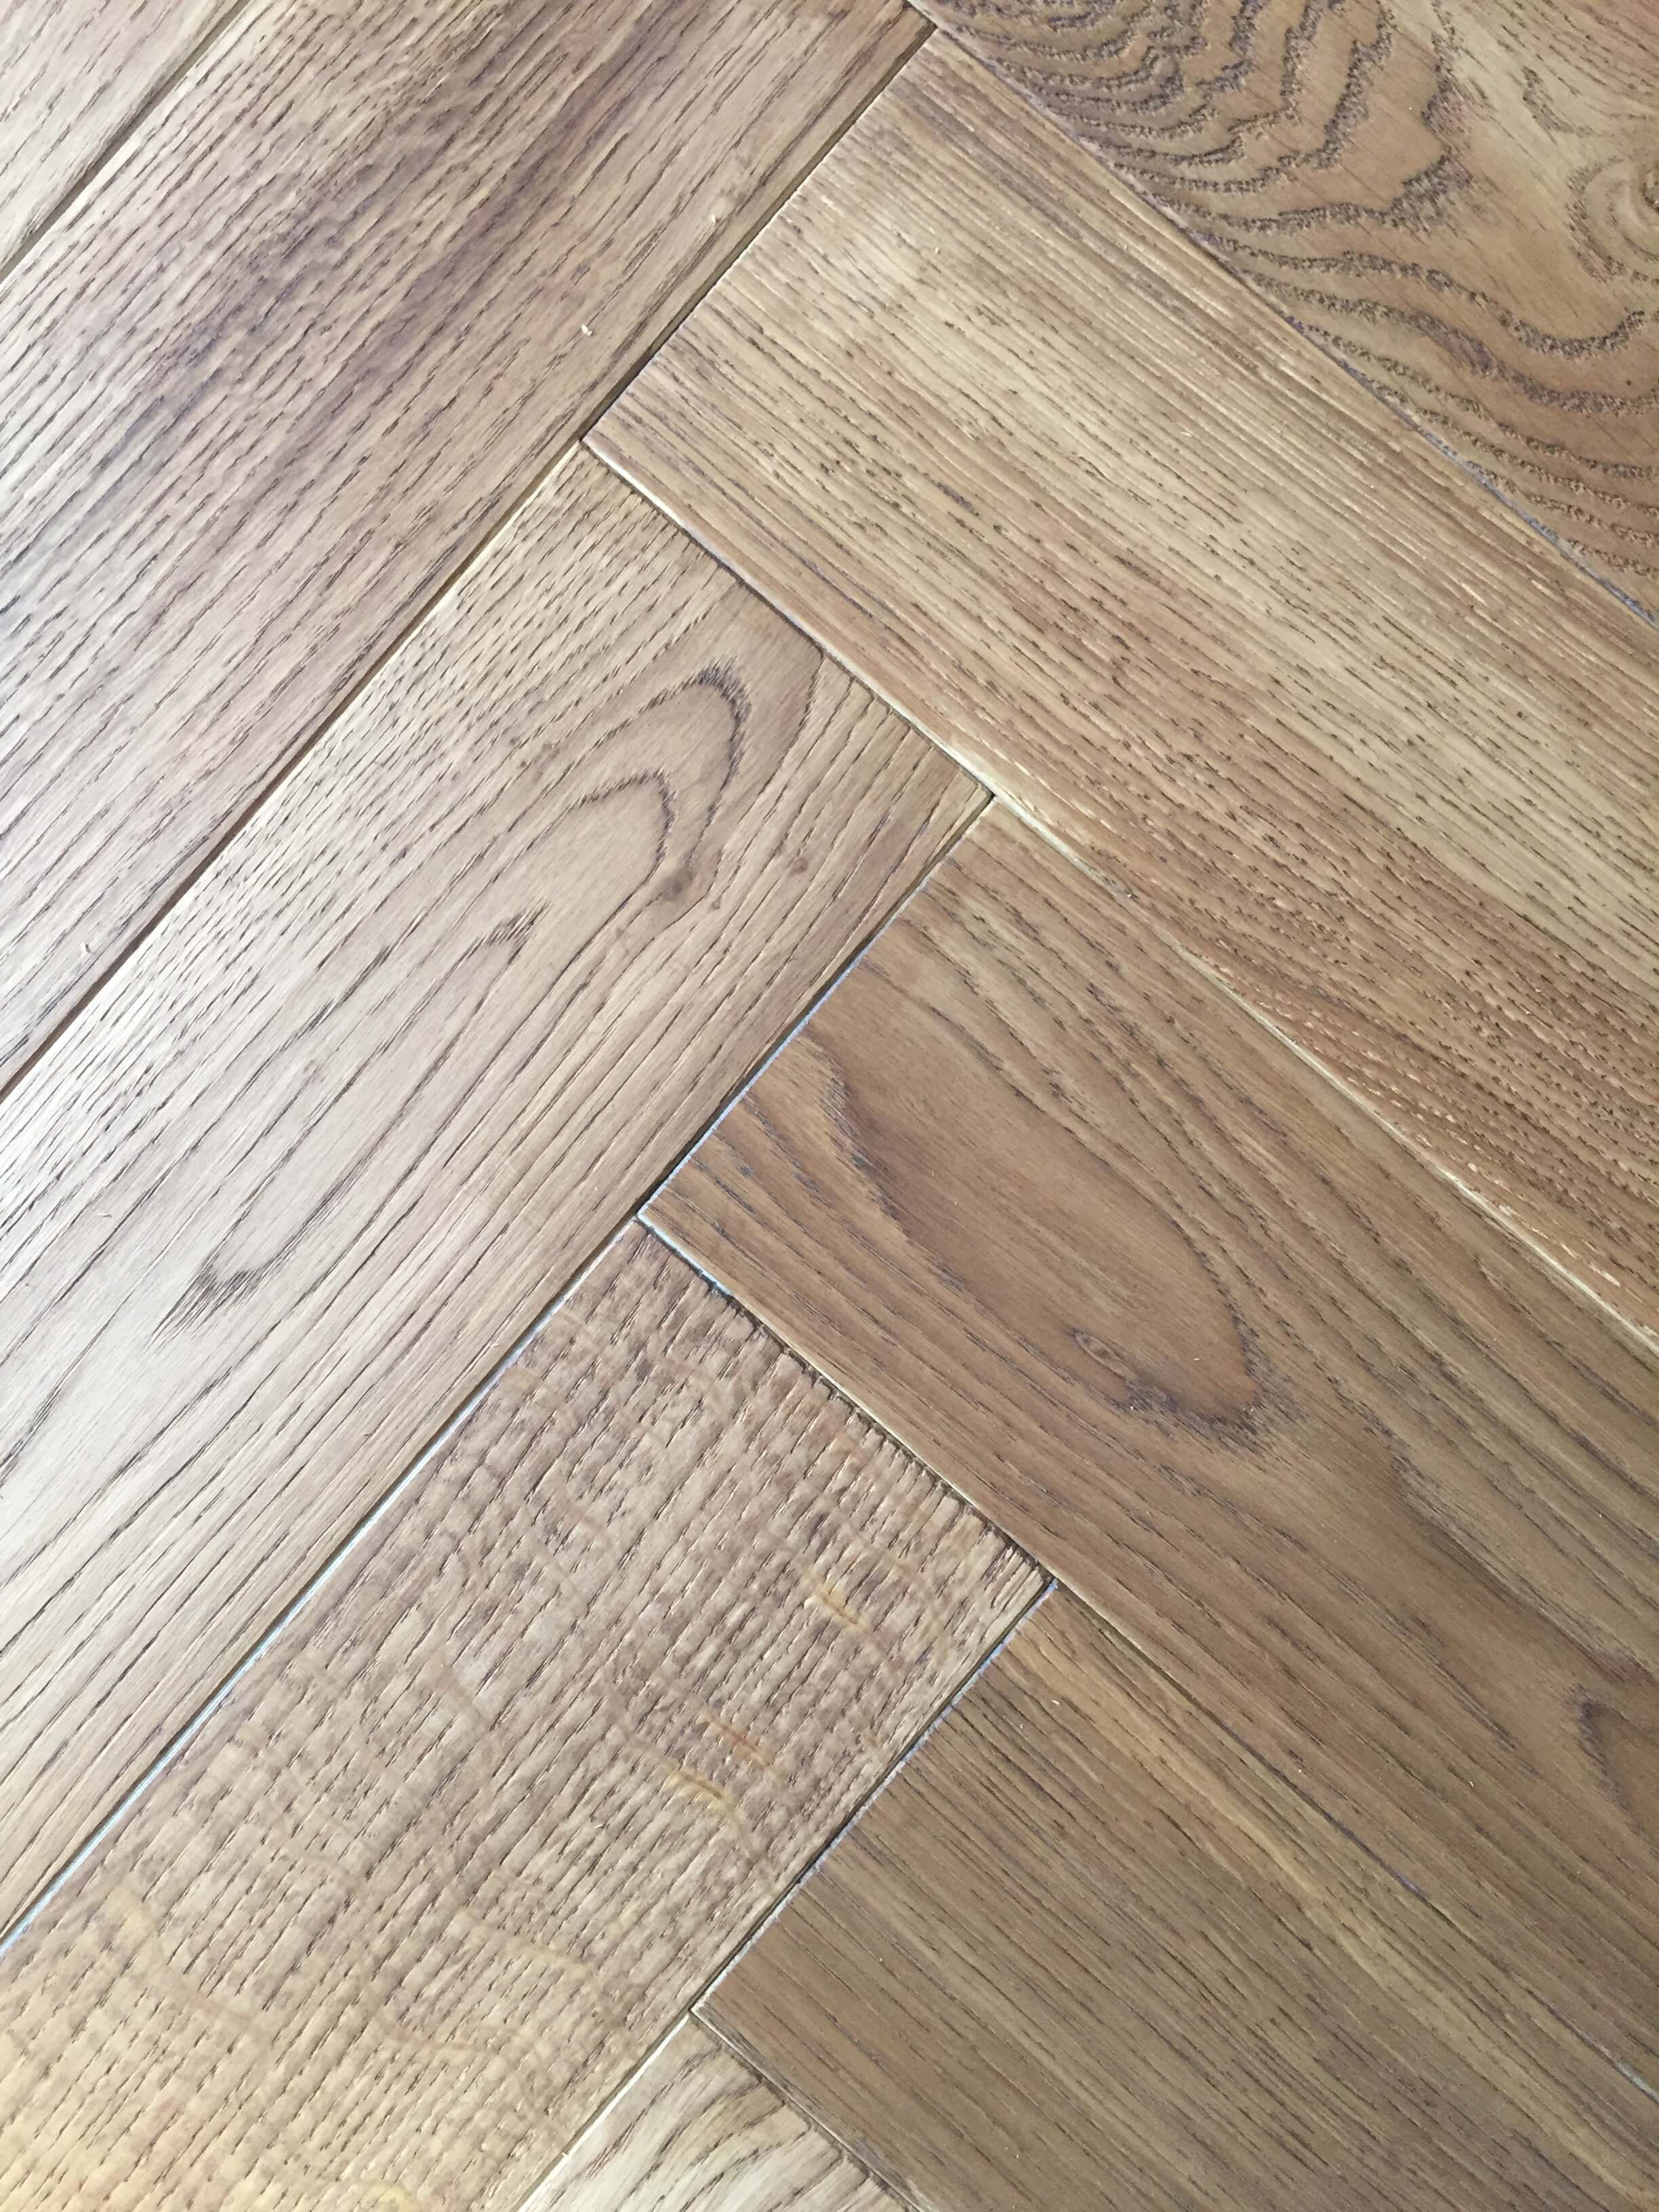 maple hardwood flooring of engineered wood flooring brown maple hand scraped engineered intended for engineered wood flooring new decorating an open floor plan living room awesome design plan 0d